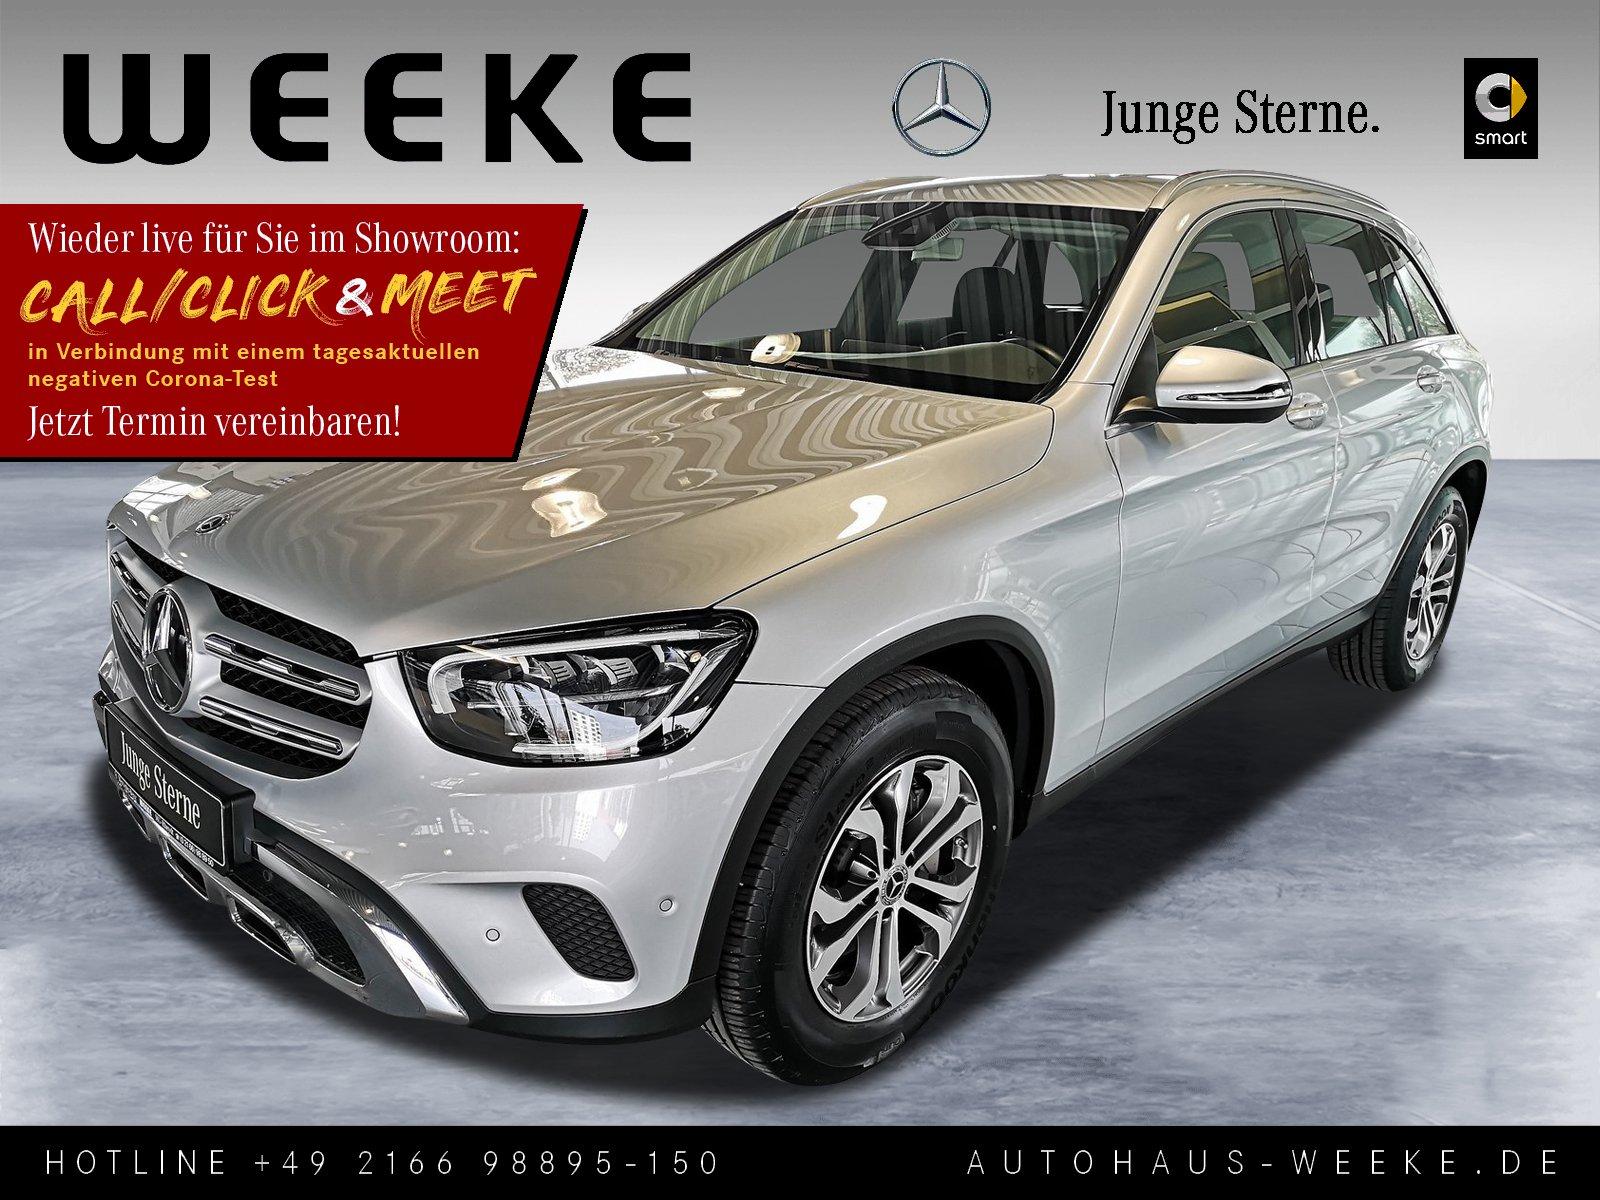 Mercedes-Benz GLC 200 d 4M Rückfahrkamera+LED+Easy-Pack+Spiege, Jahr 2019, Diesel